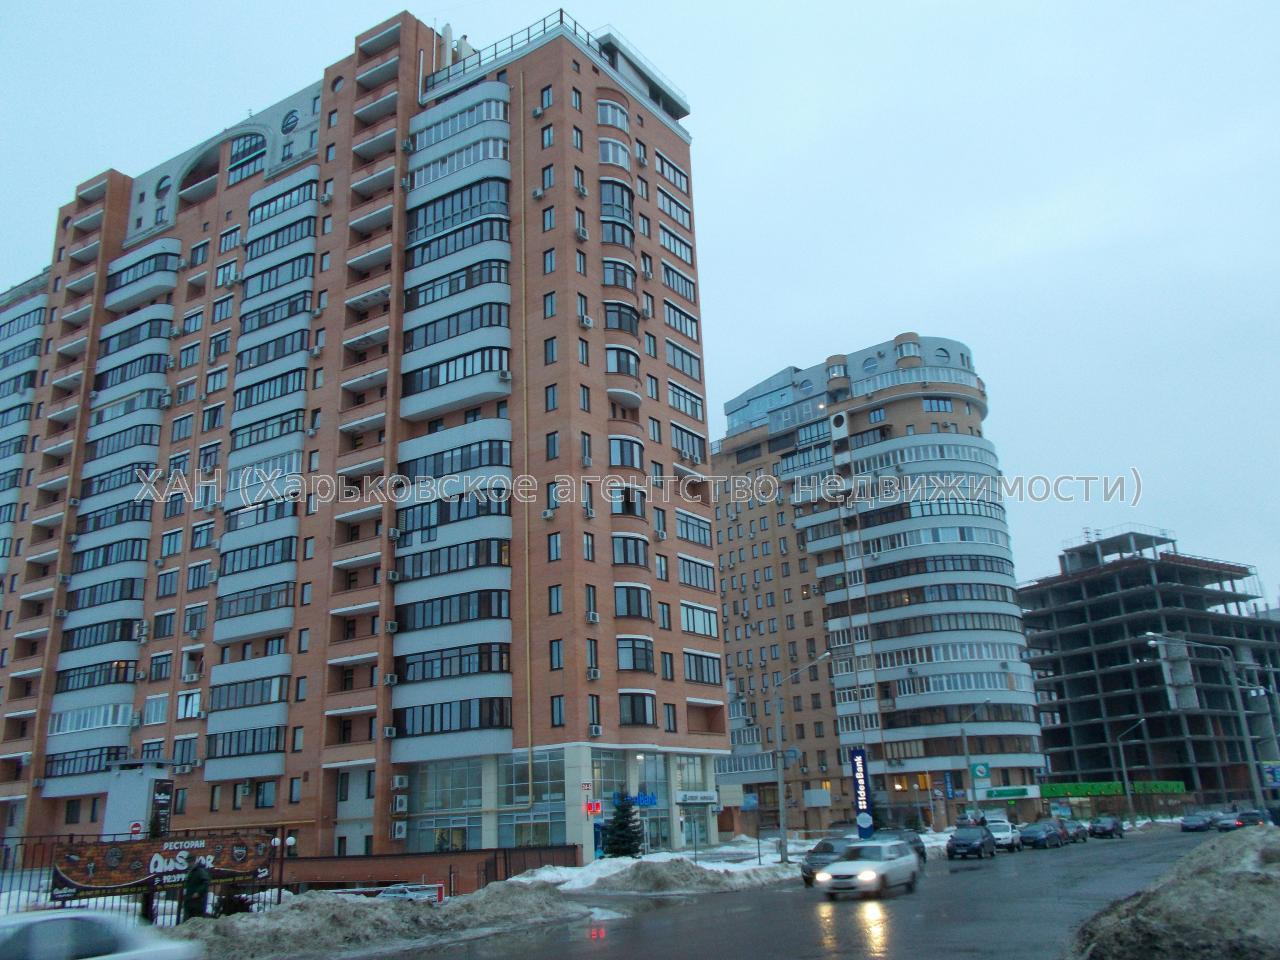 Фото - Продам офис в многоквартирном доме Харьков, Отакара Яроша ул.